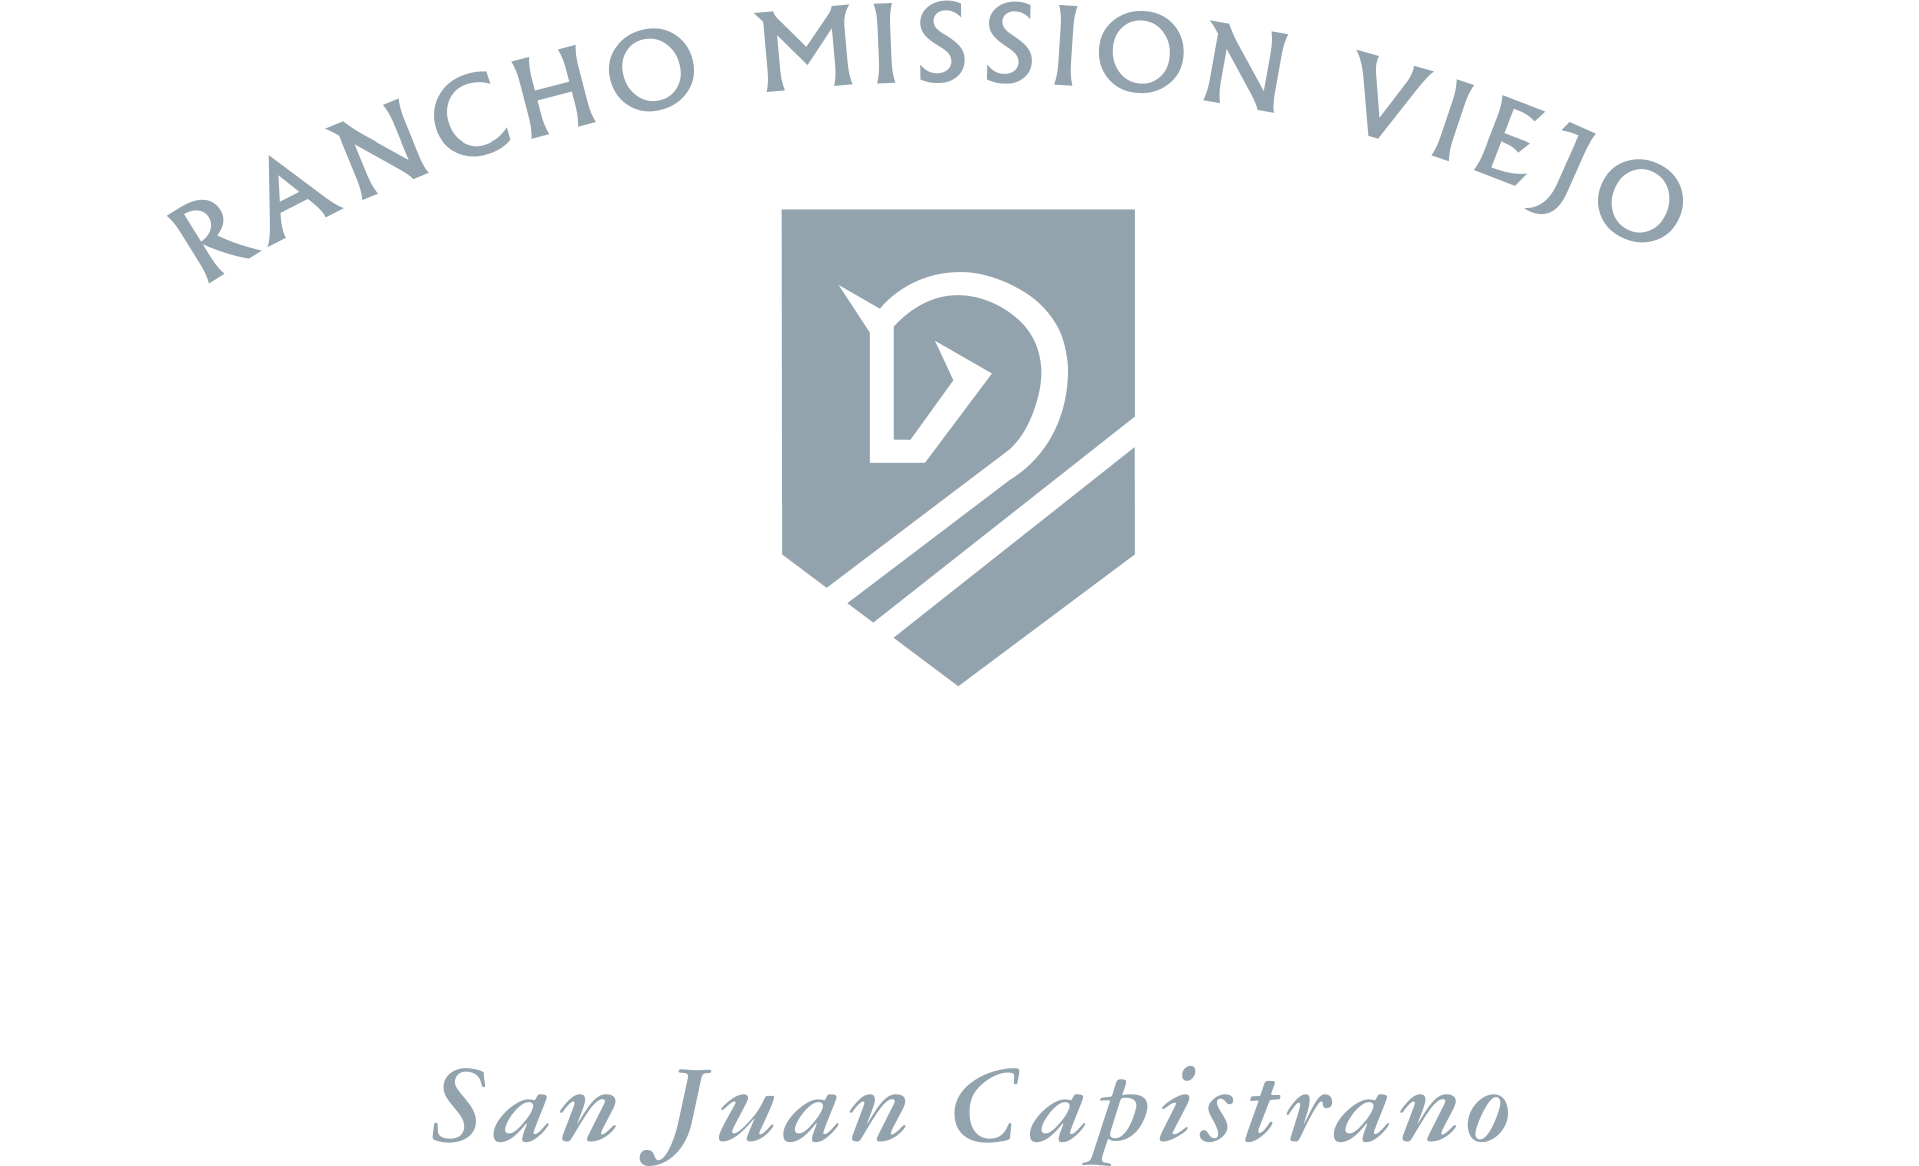 Full Riding Park Logo